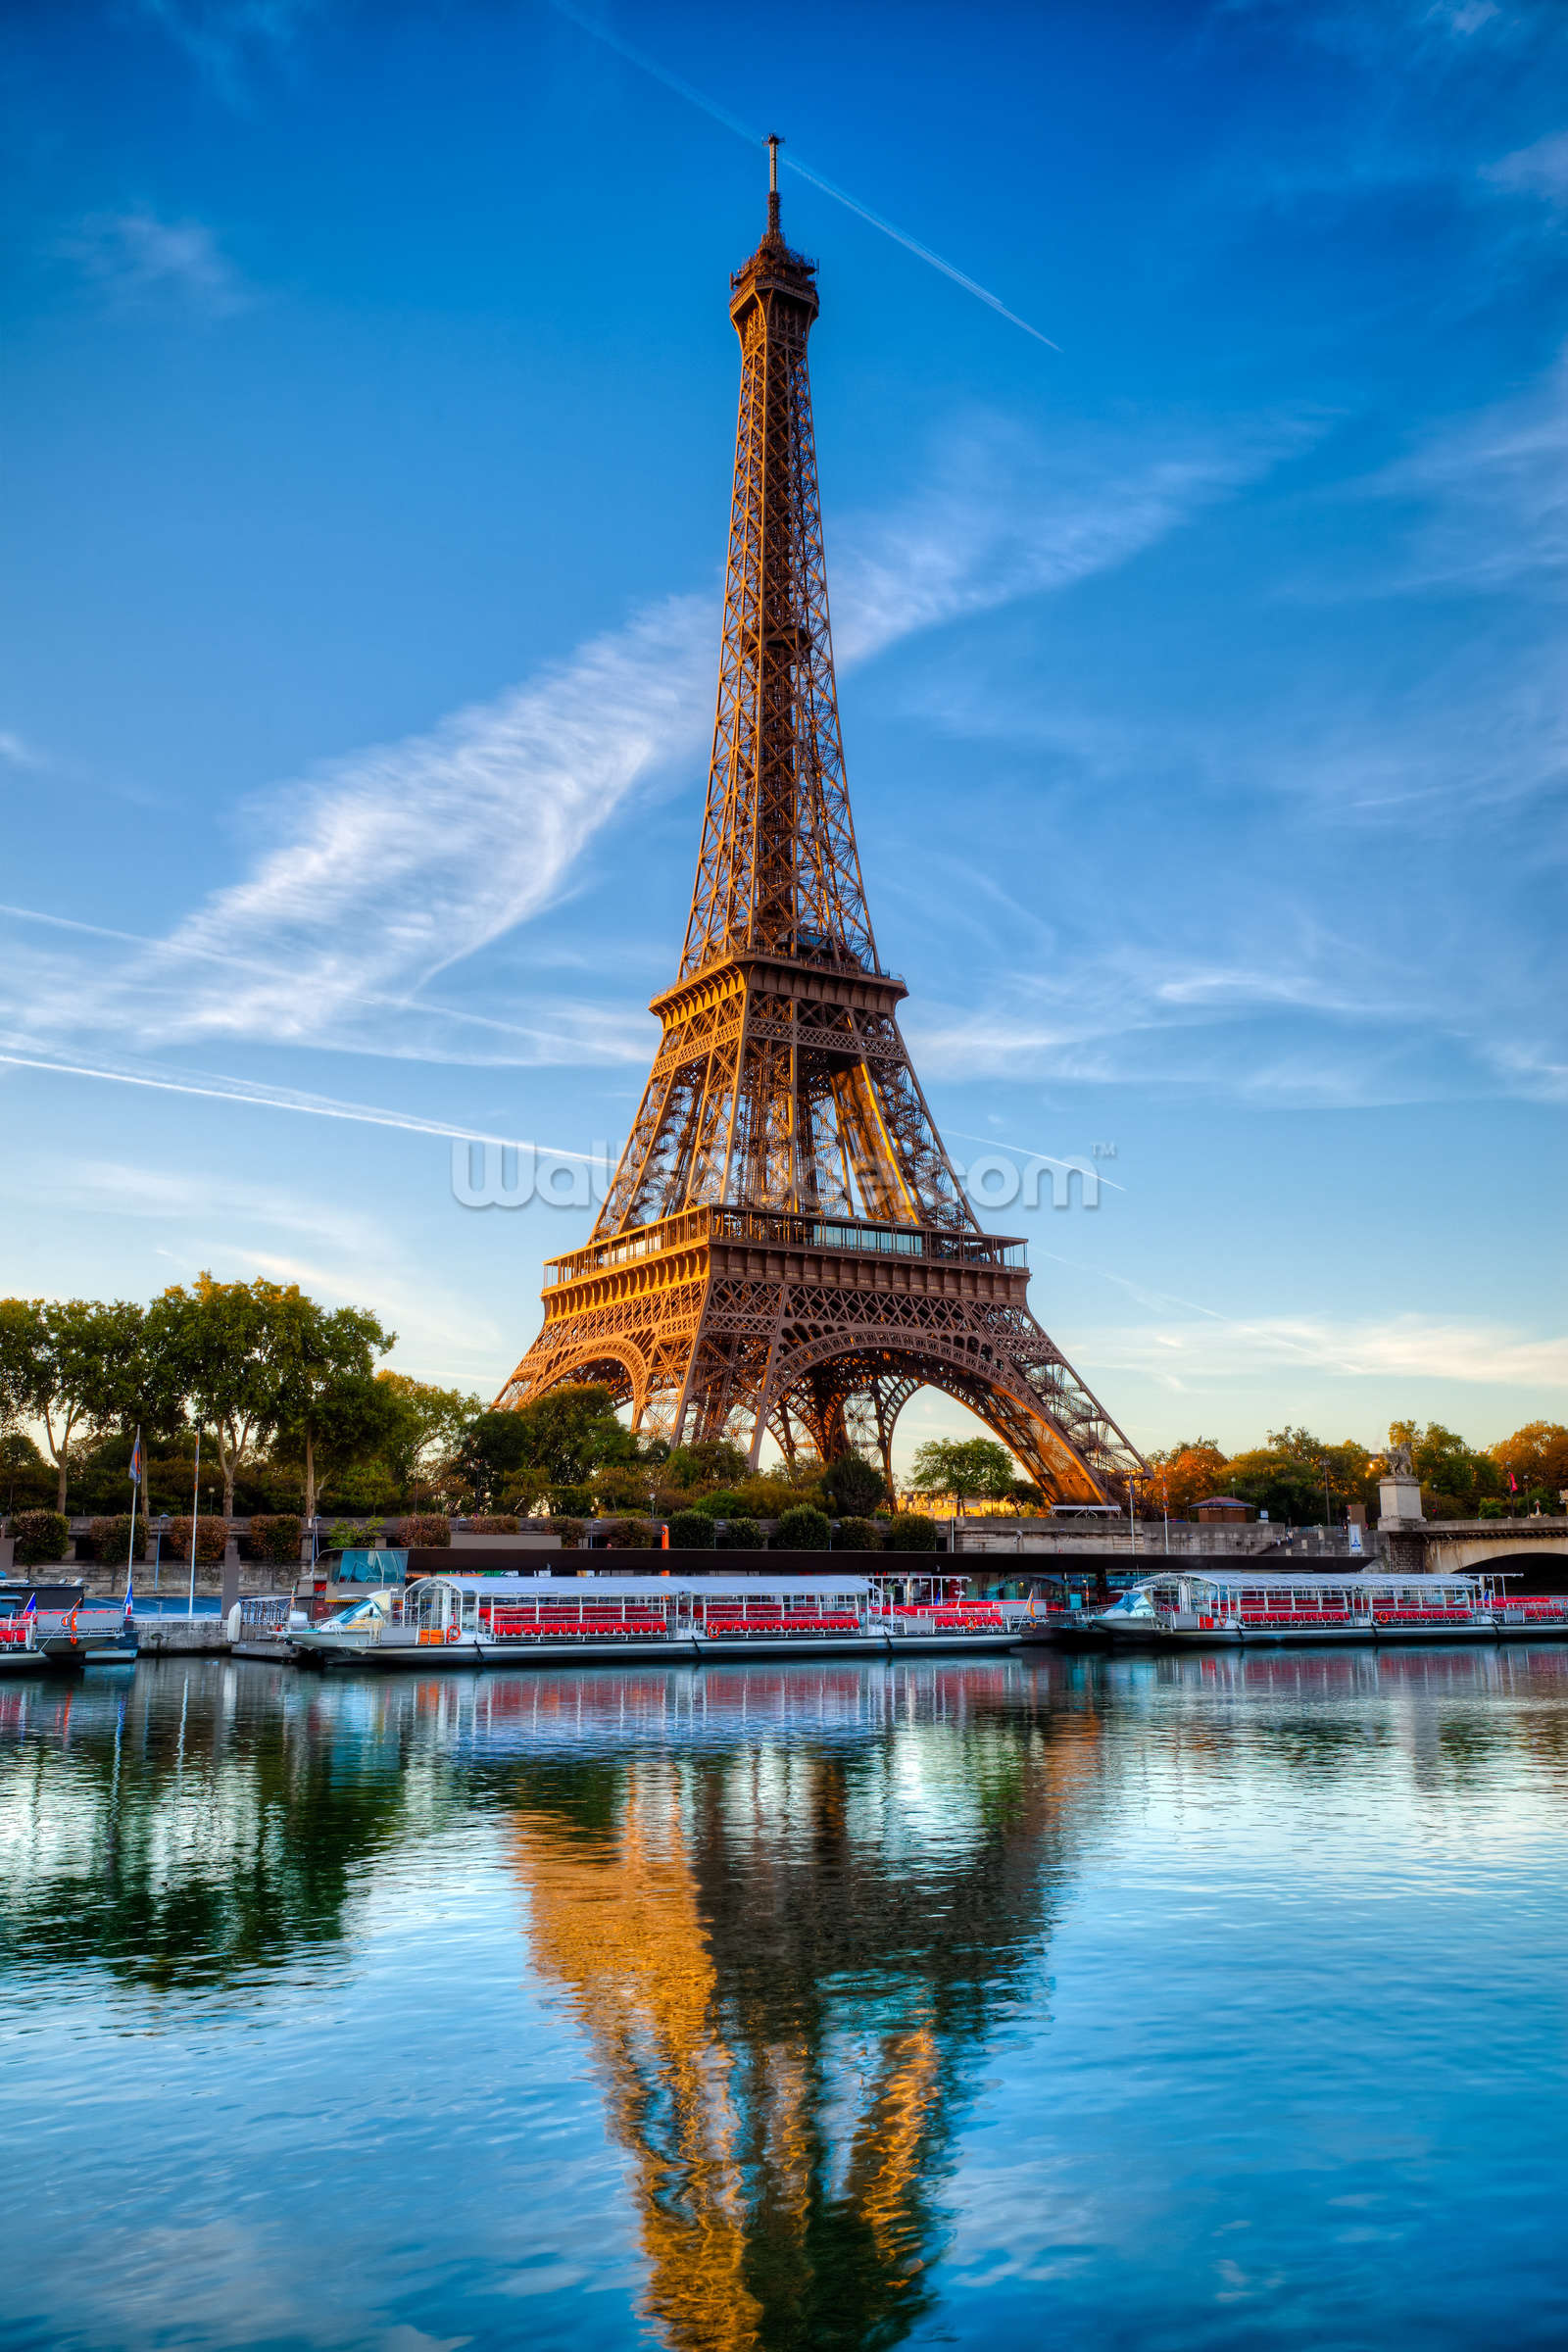 Eiffel Tower Reflection Wall Mural Photo Wallpaper Part 87